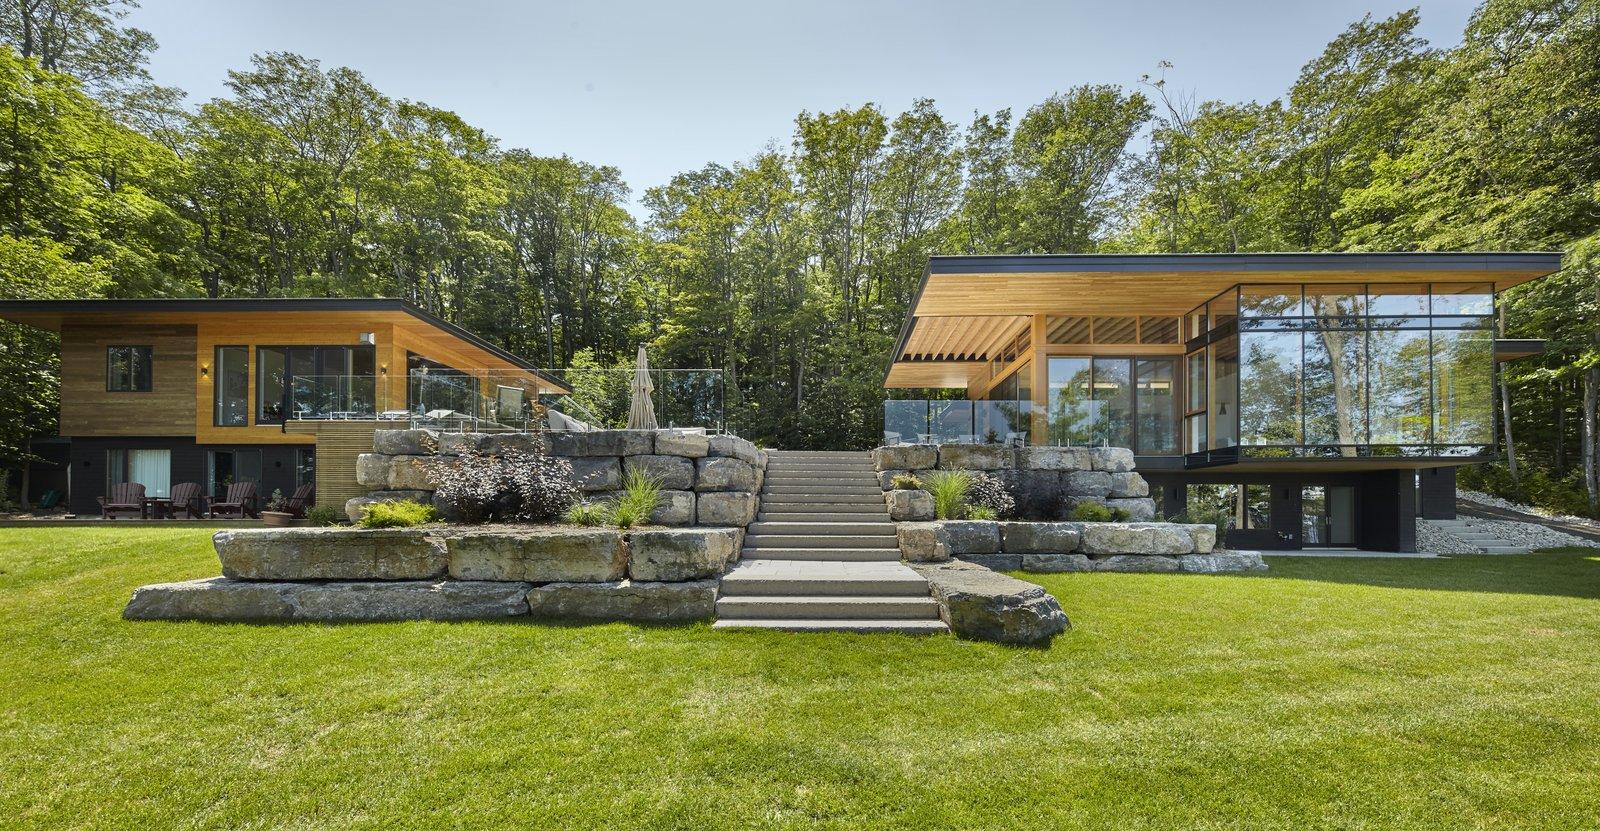 Severn Sound Cottage Modern Home In Penetanguishene Ontario Canada On Dwell